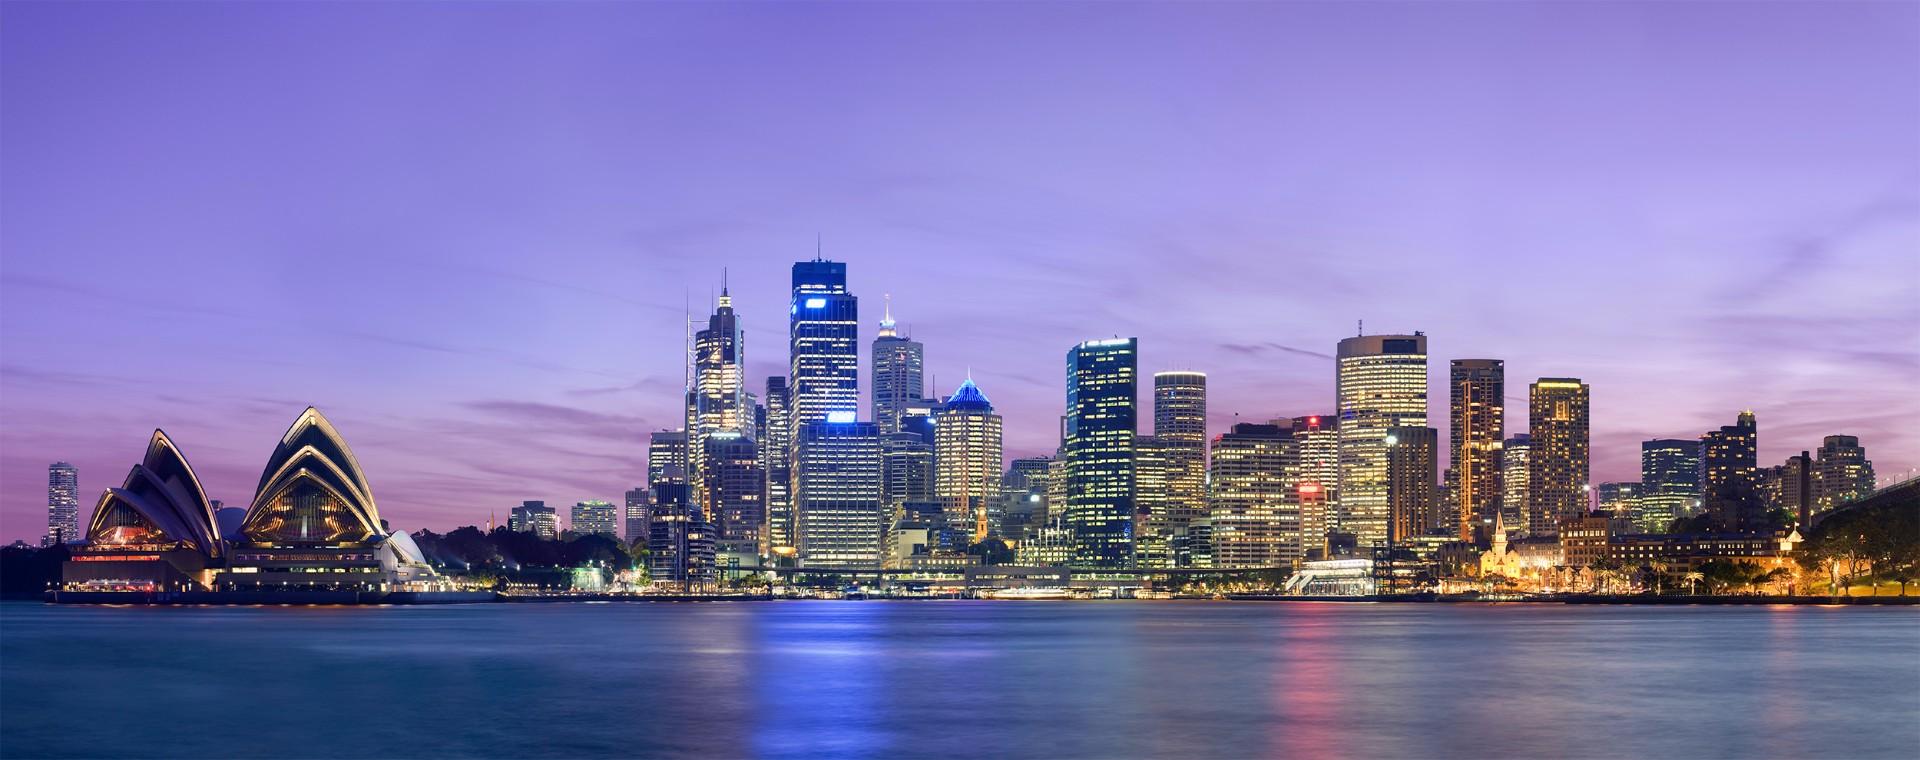 Sydney Population in 2017